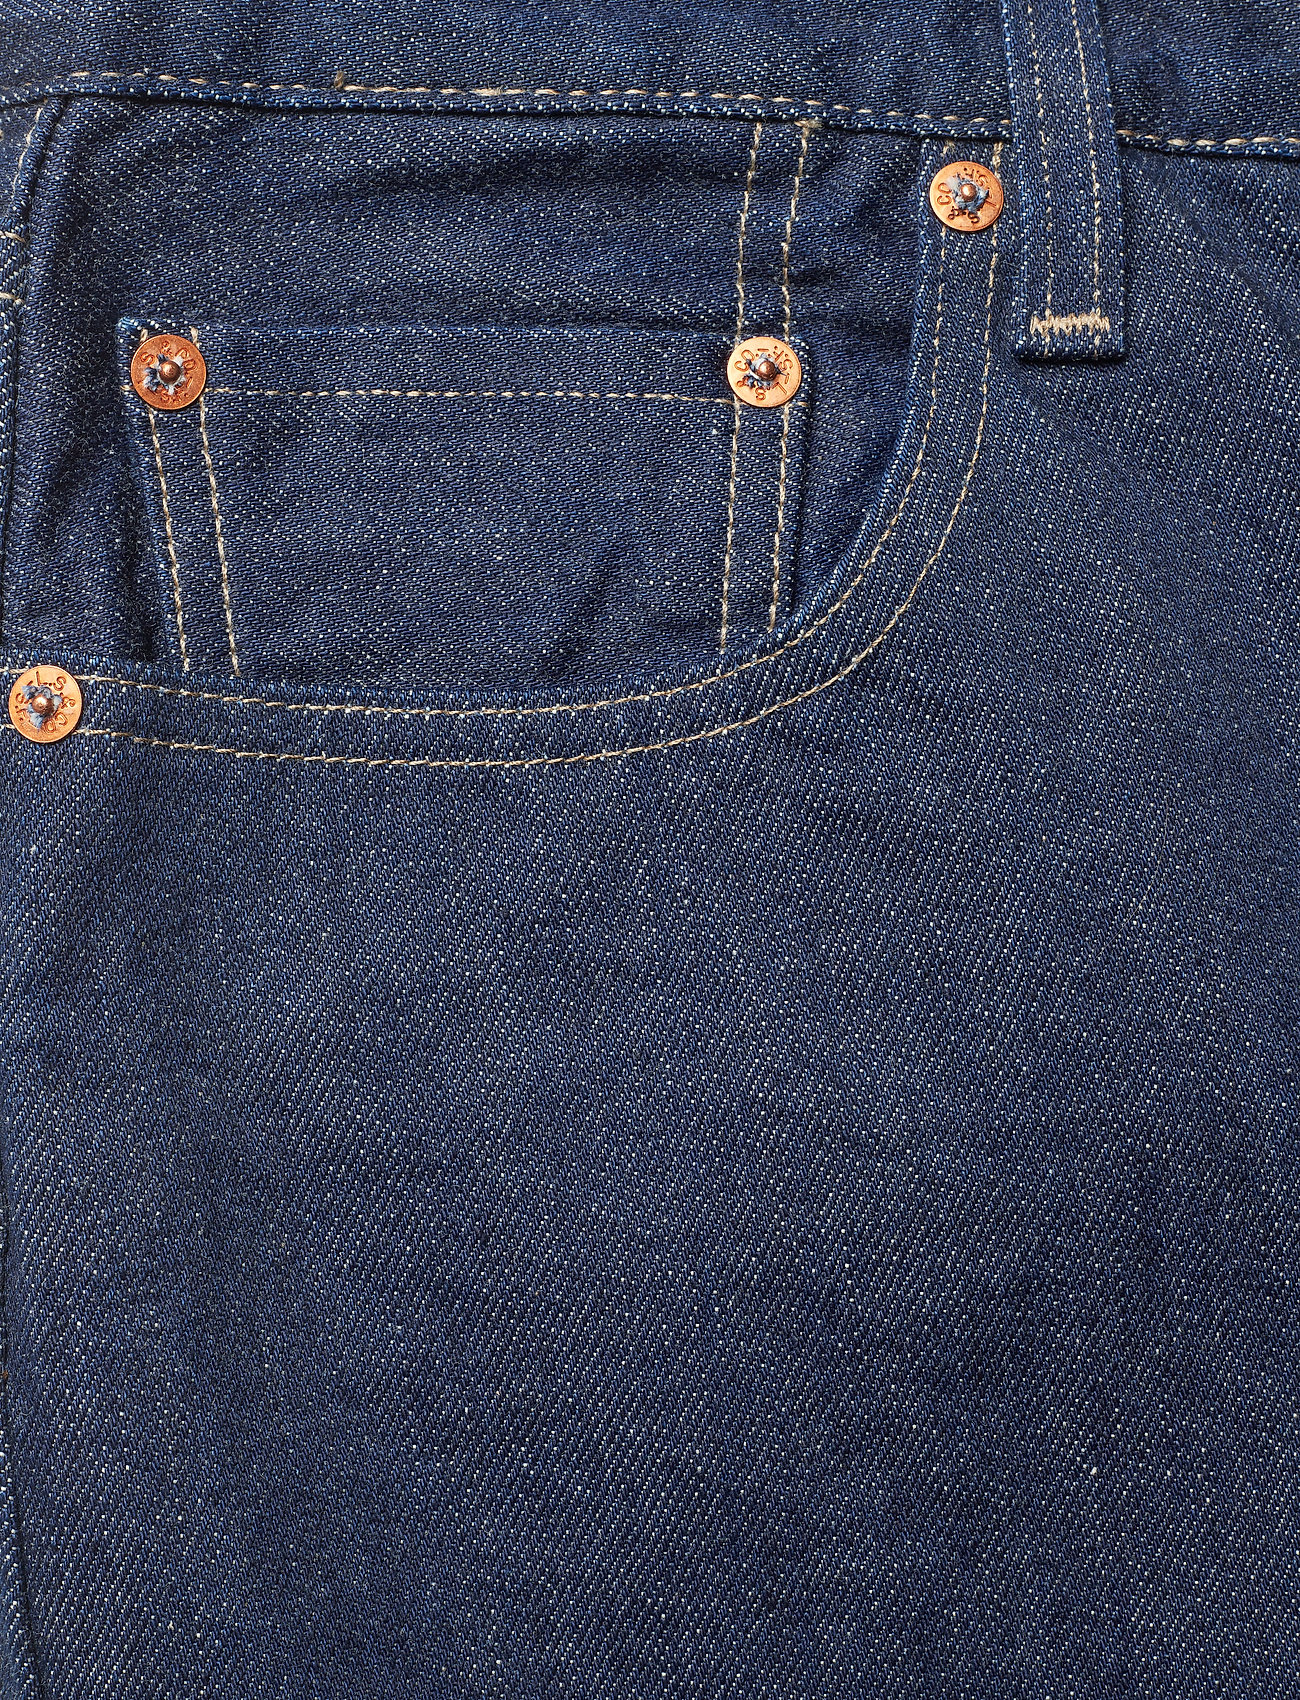 Levi's Made & Crafted - 501 CROP LMC RAW INDIGO - straight regular - dark indigo - flat finish - 2